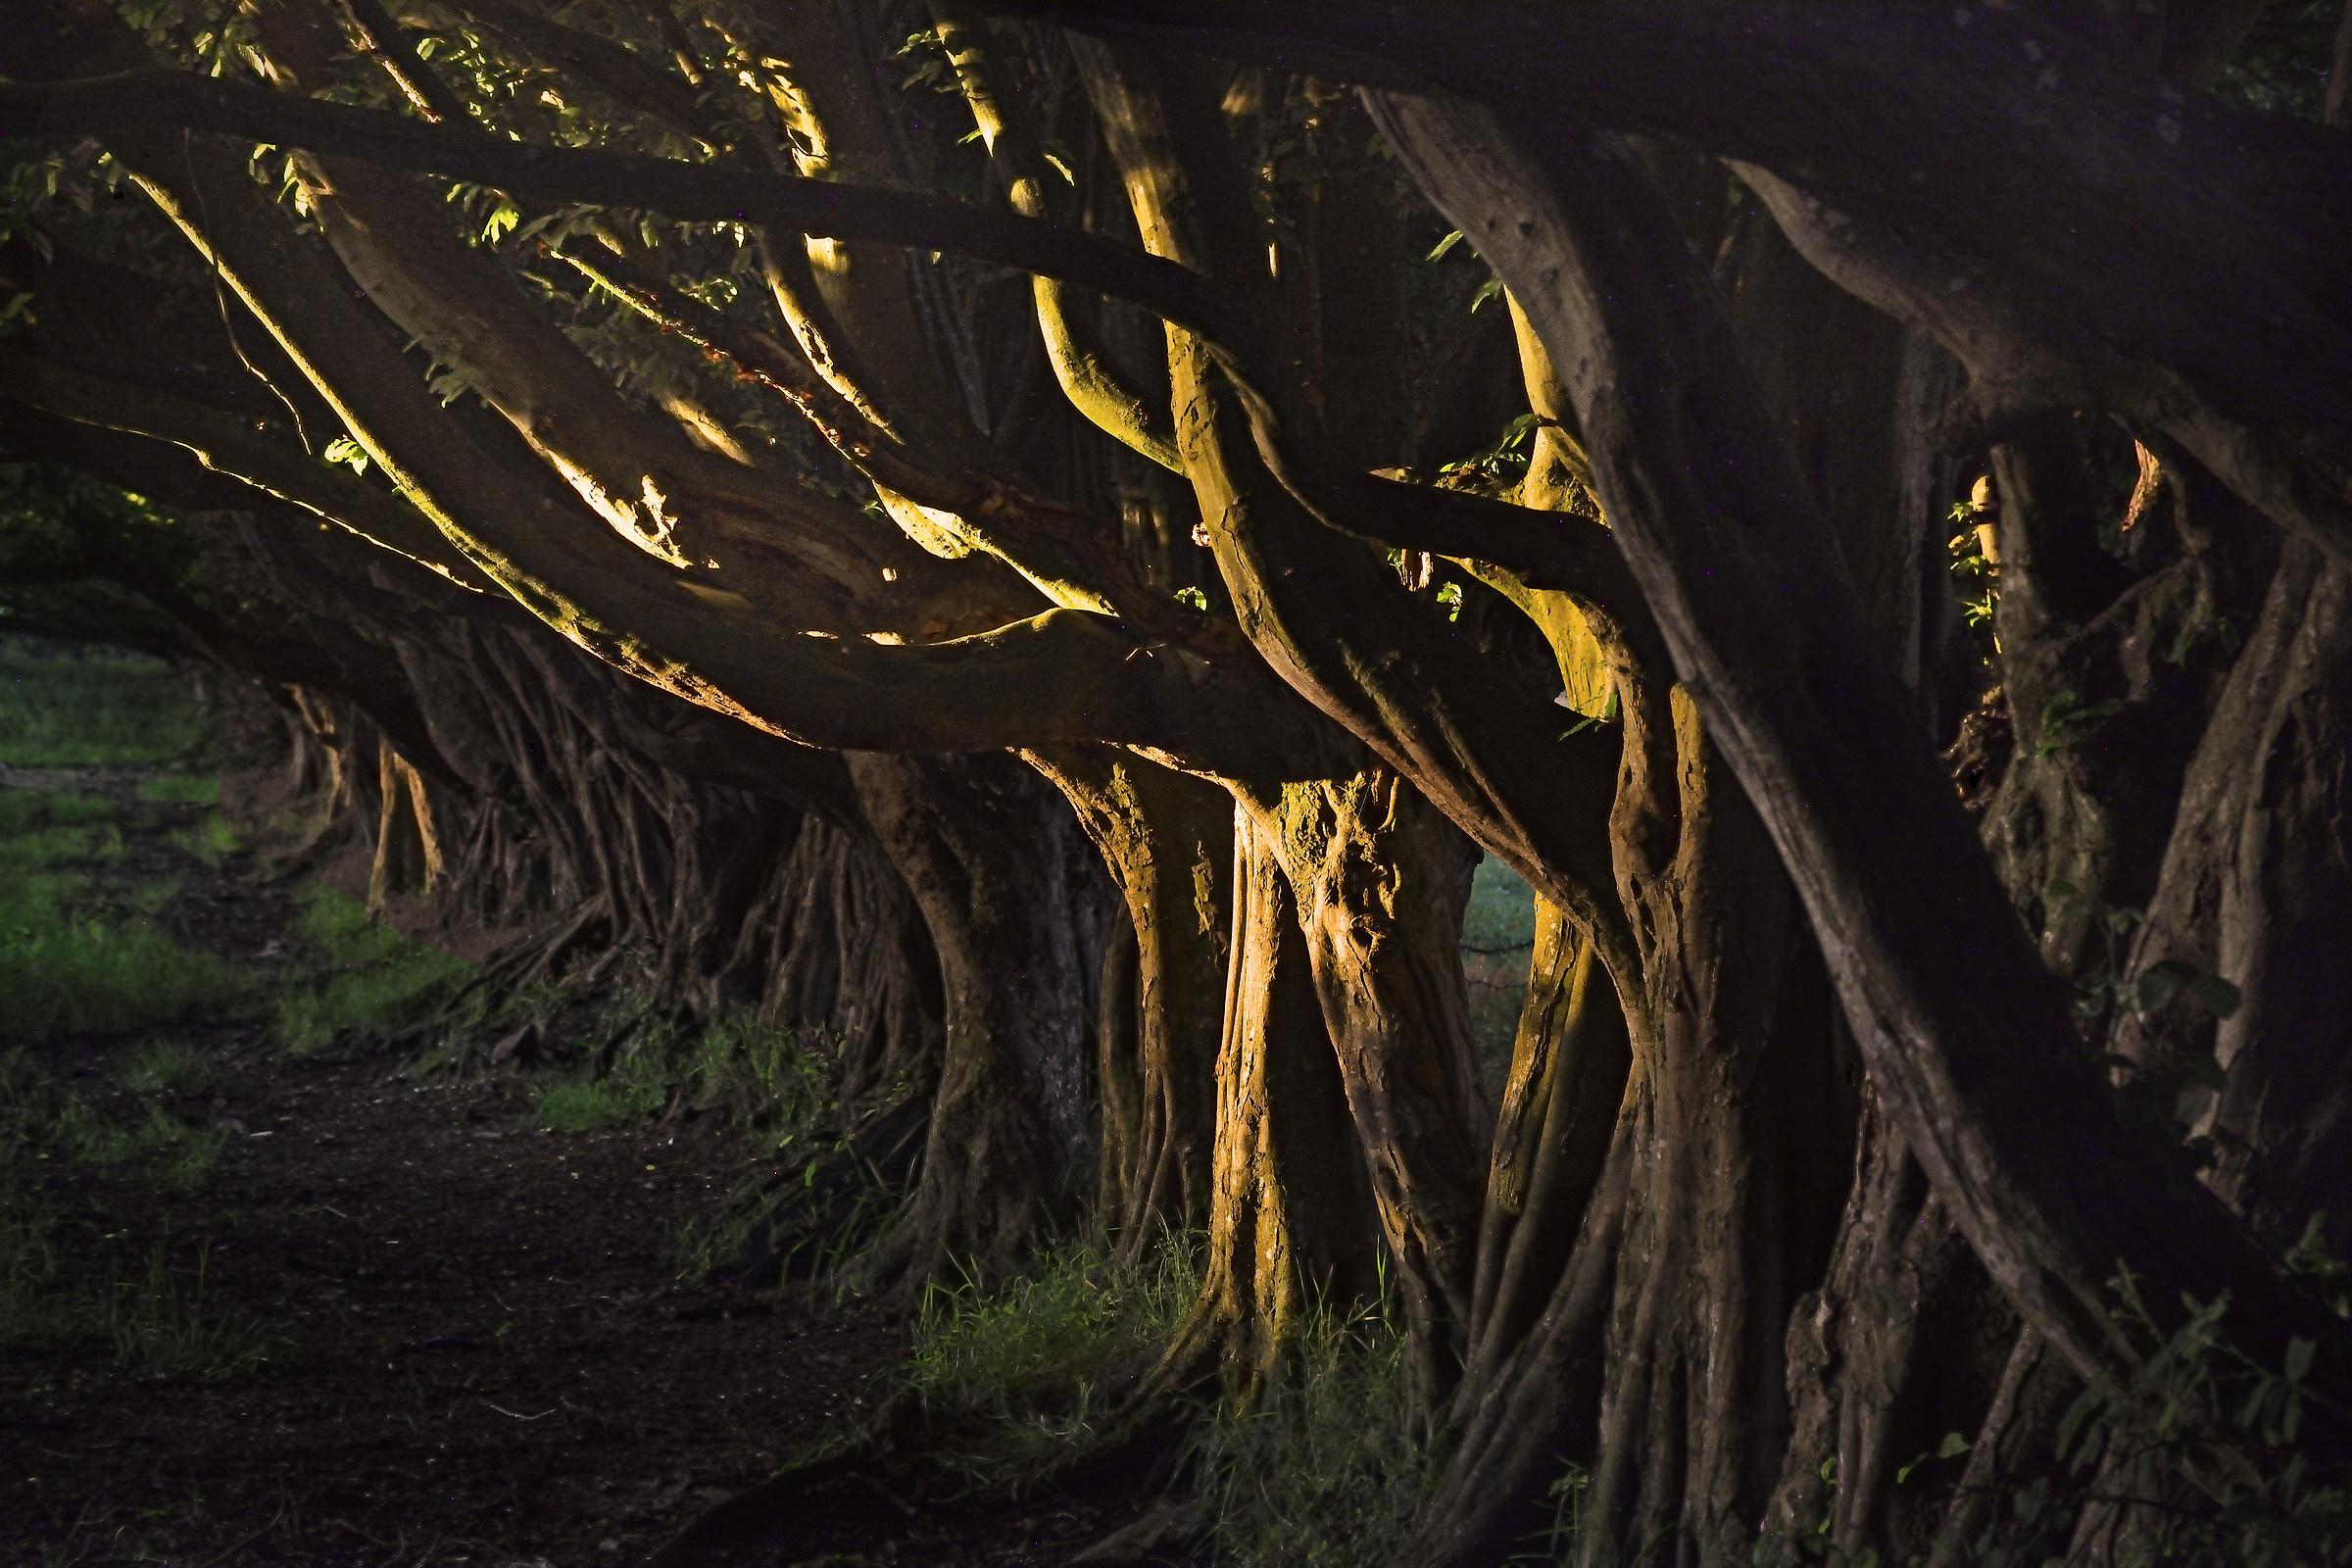 Un limite antico del campo, al tramonto...